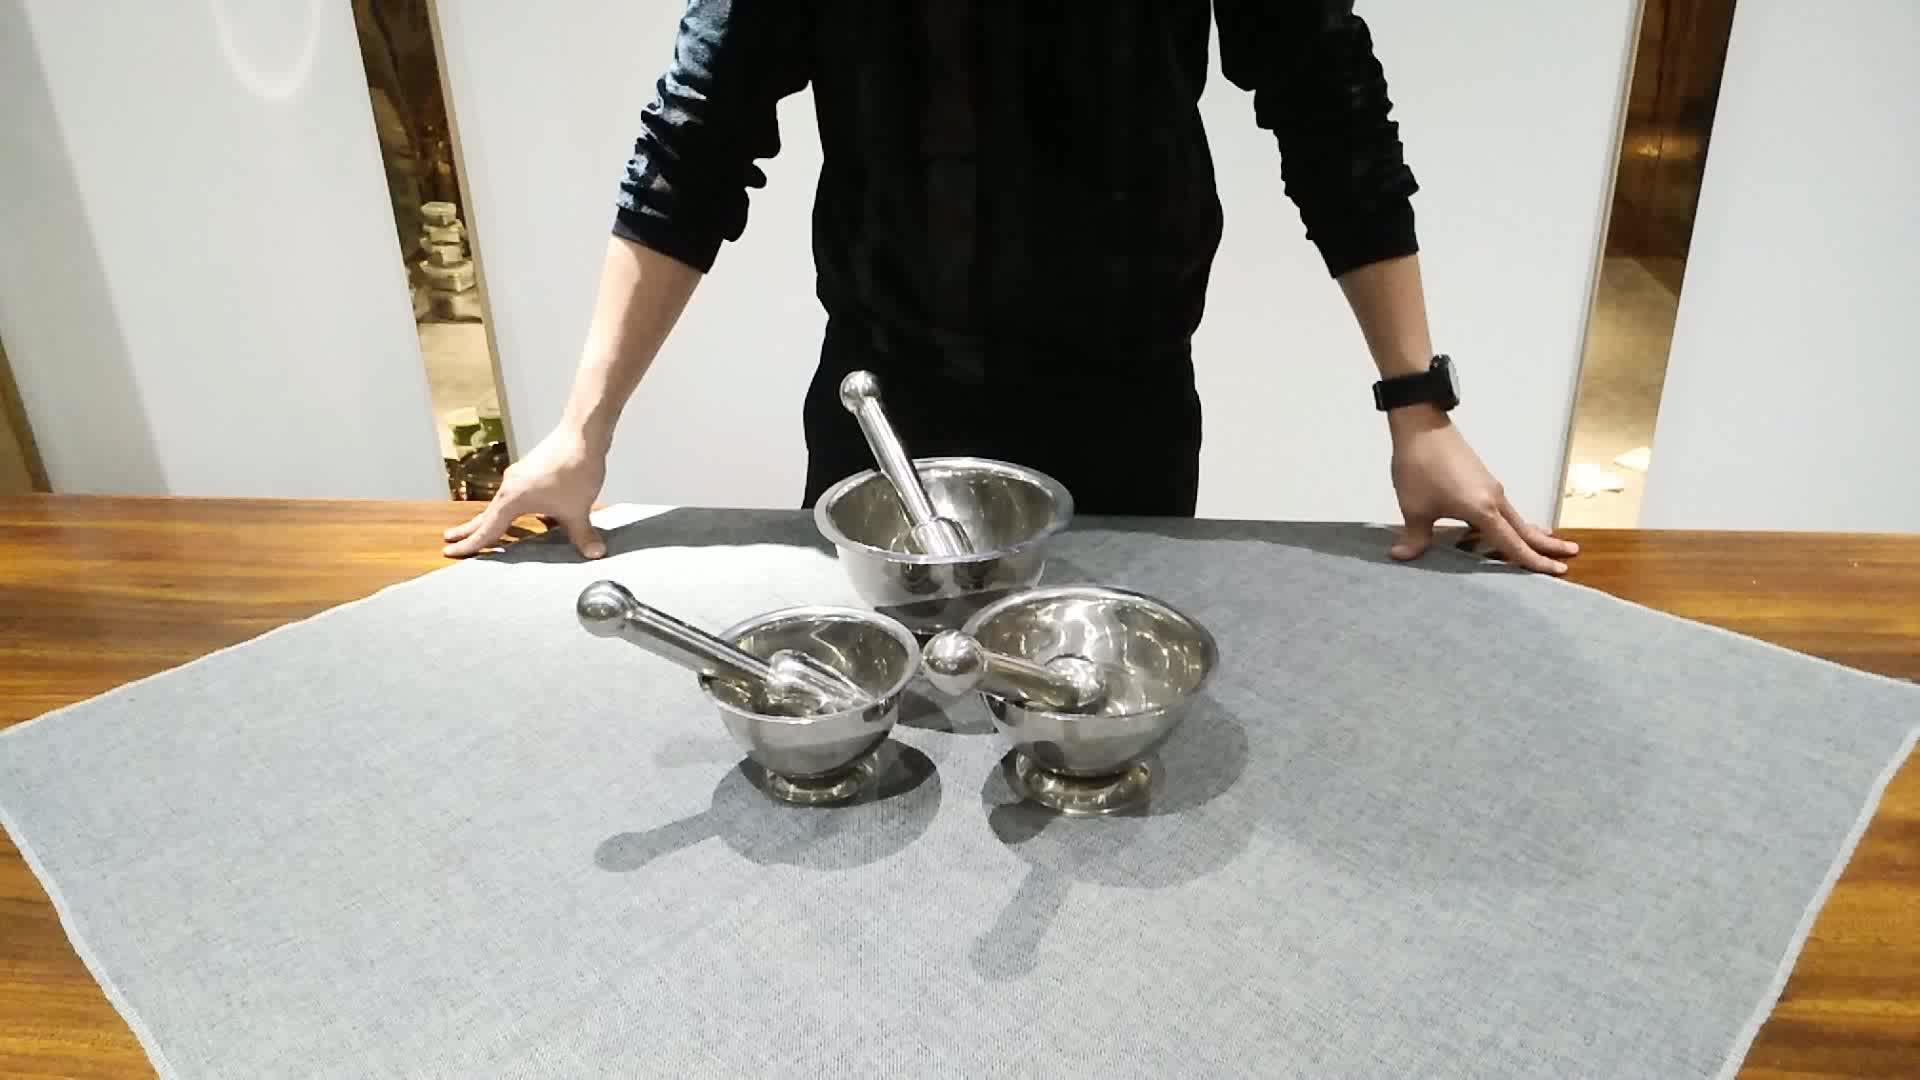 Groothandel dubbelwandige rvs knoflookpers molen kom spice grinder geneeskunde beukende kom